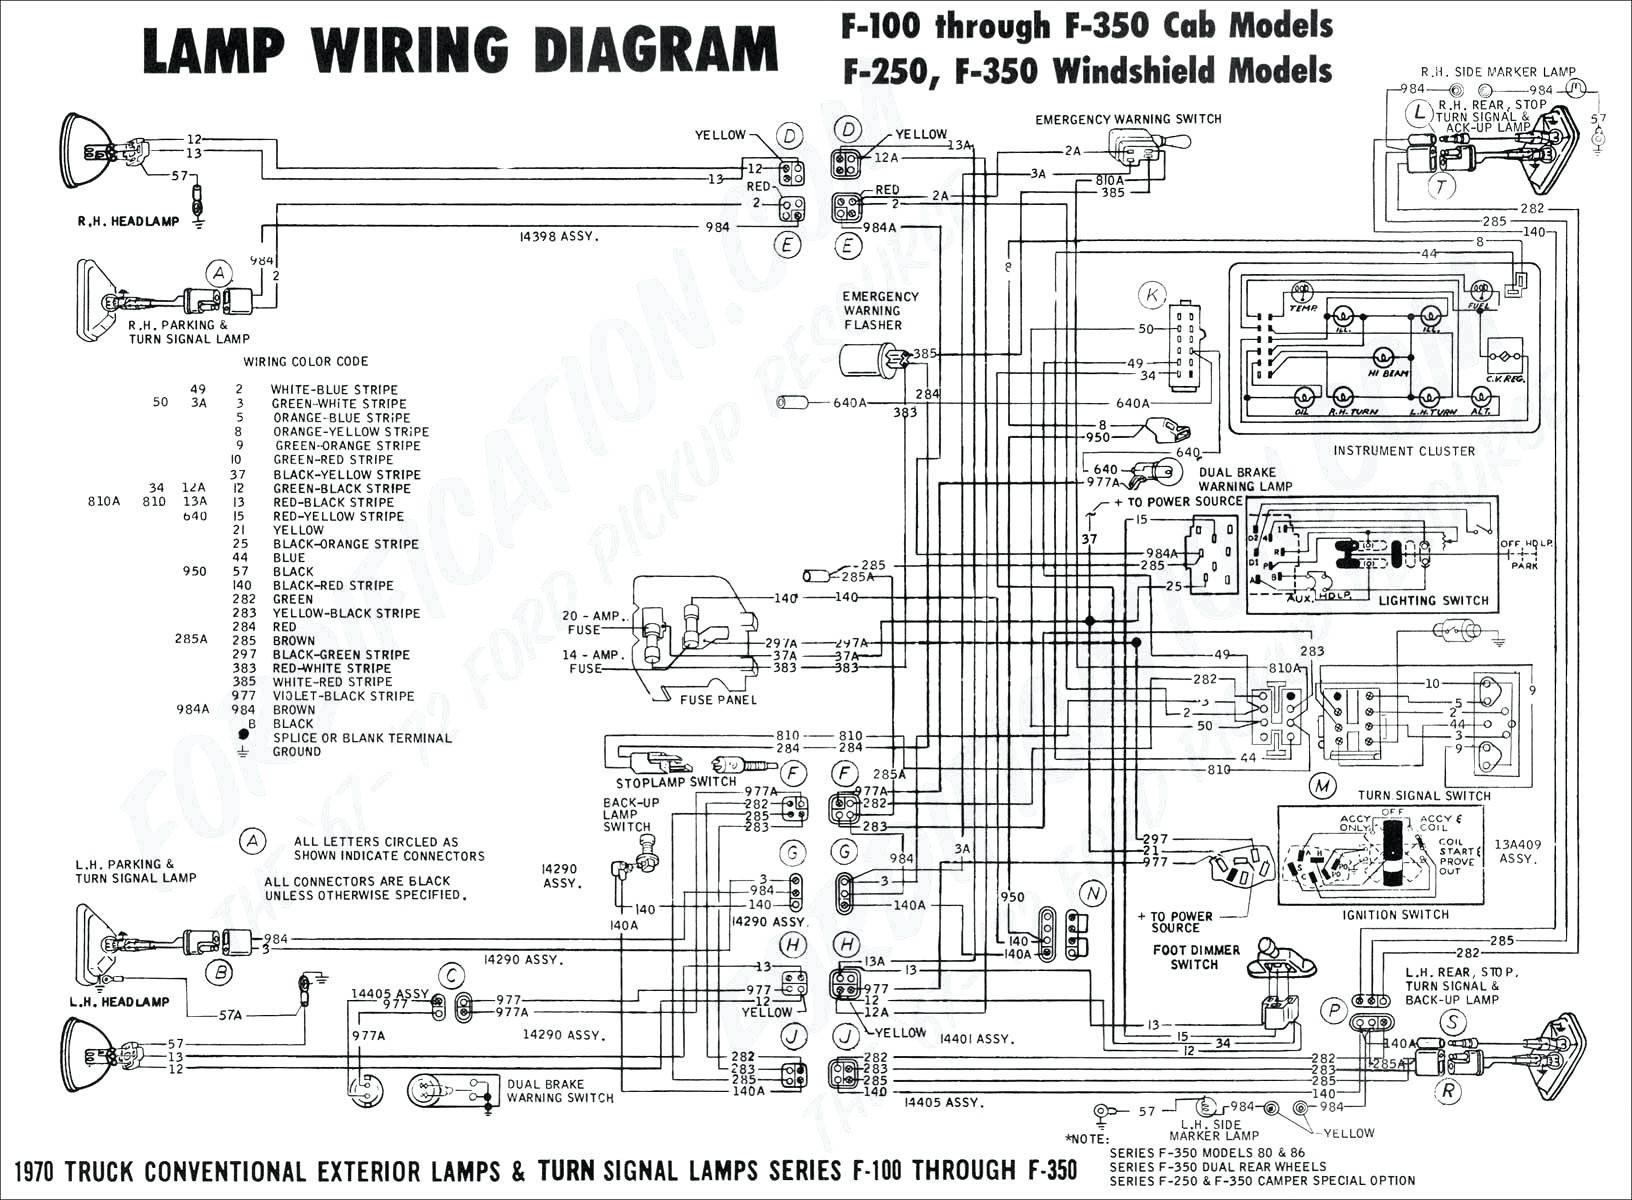 1992 toyota previa wiring diagram